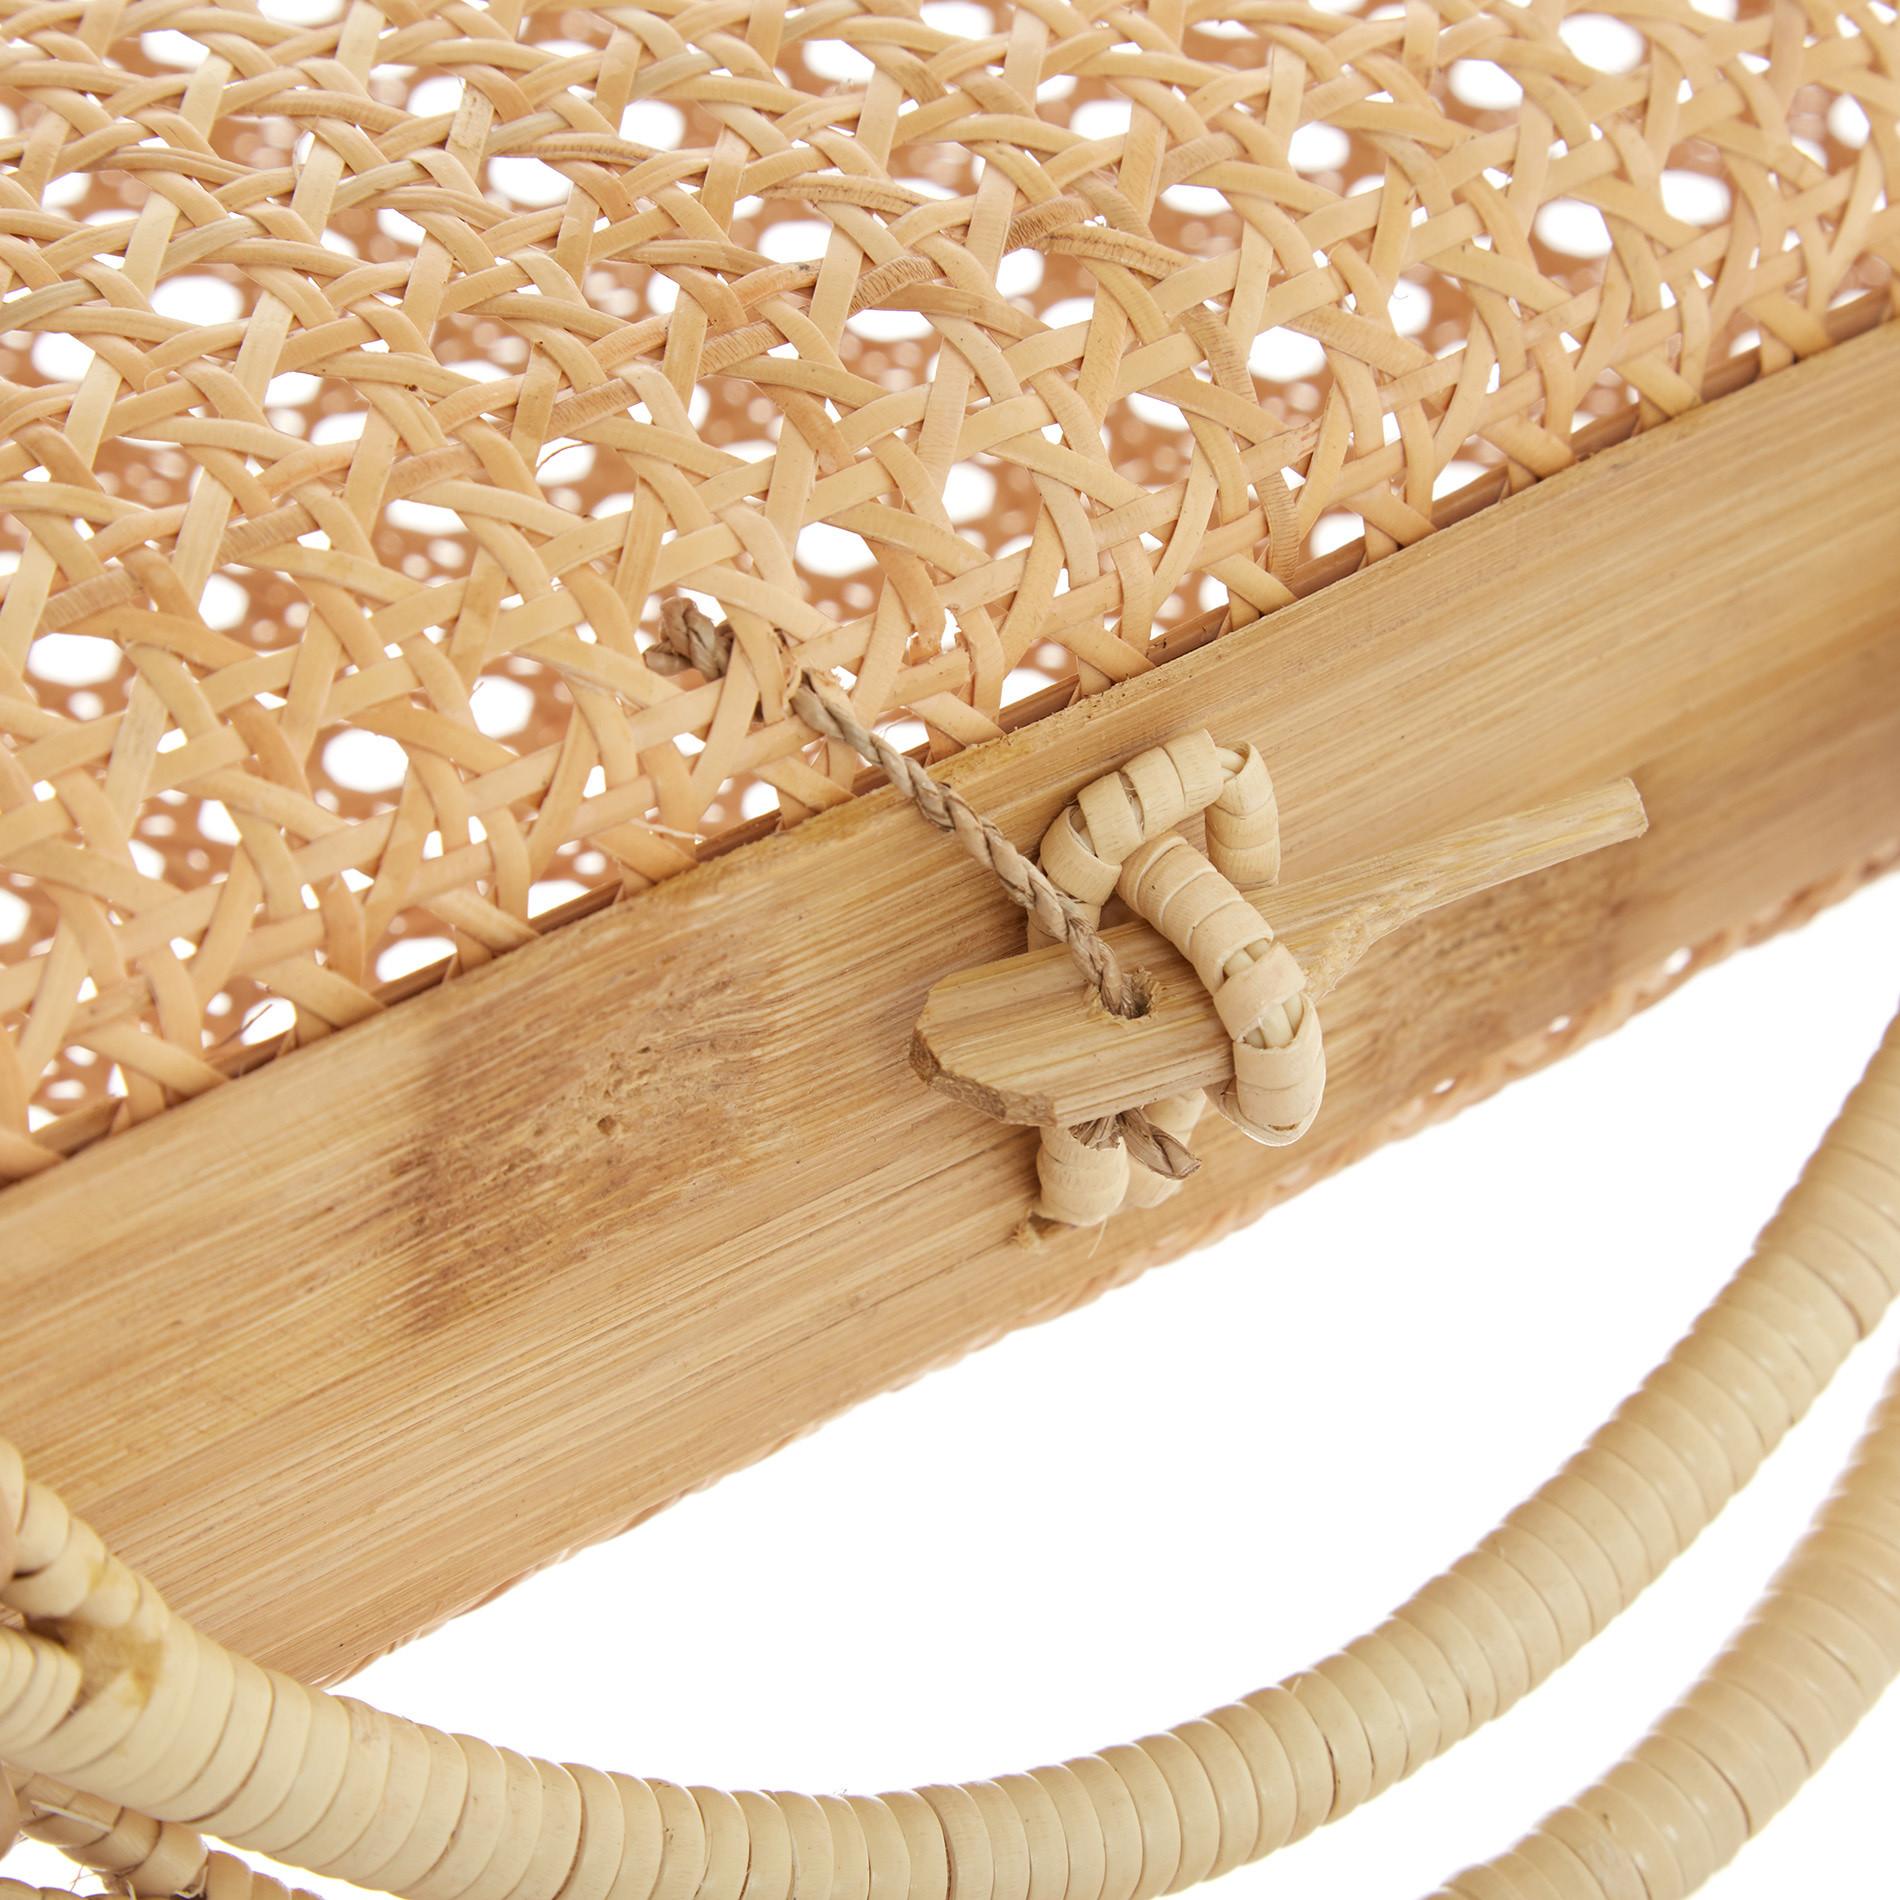 Borsa rattan e bamboo intrecciati a mano, Trasparente, large image number 2